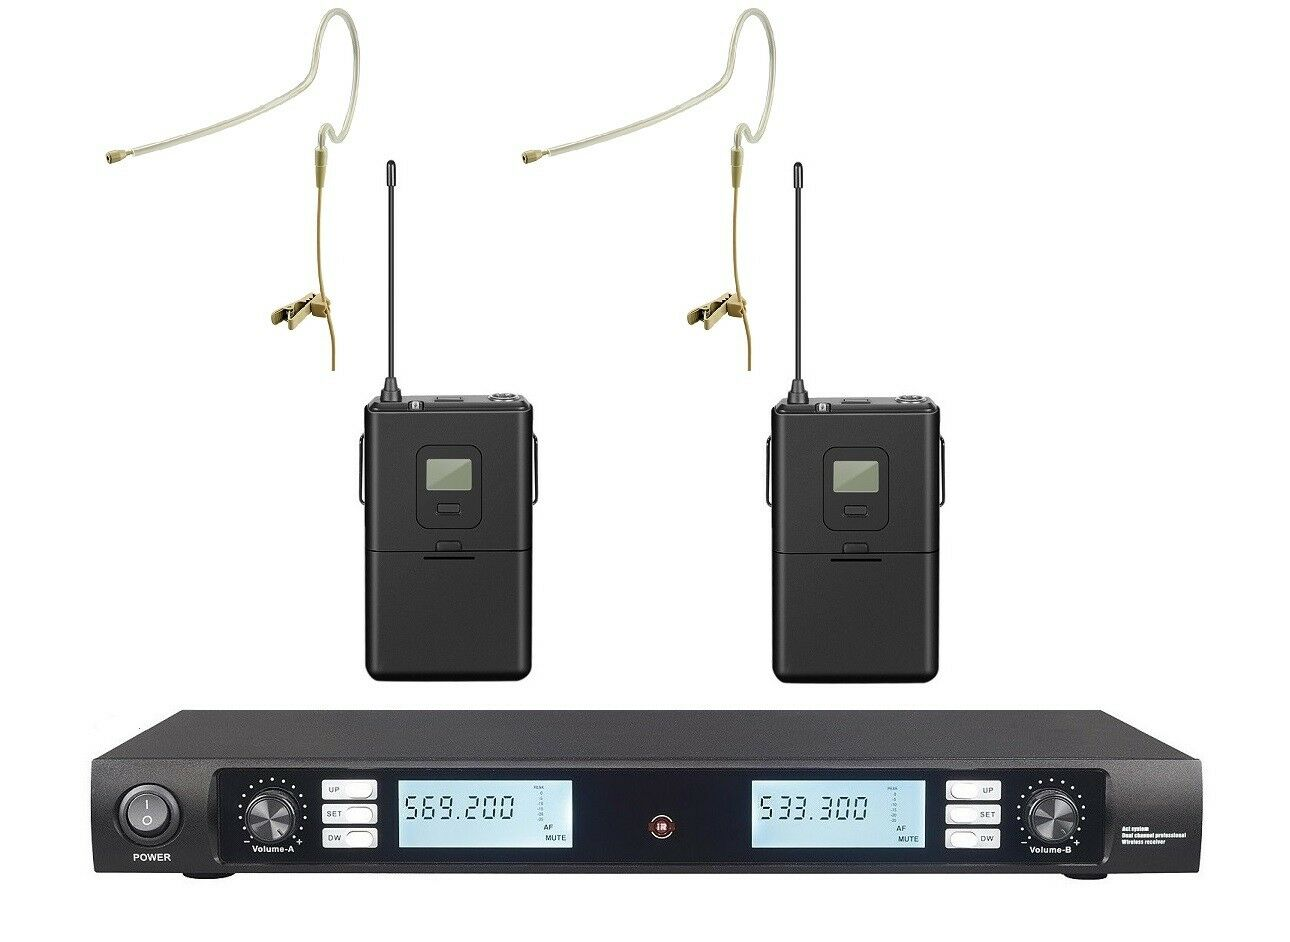 Auriculares inalámbricos de una sola Earset uhf doble sistema sistema sistema de micrófono de cabeza